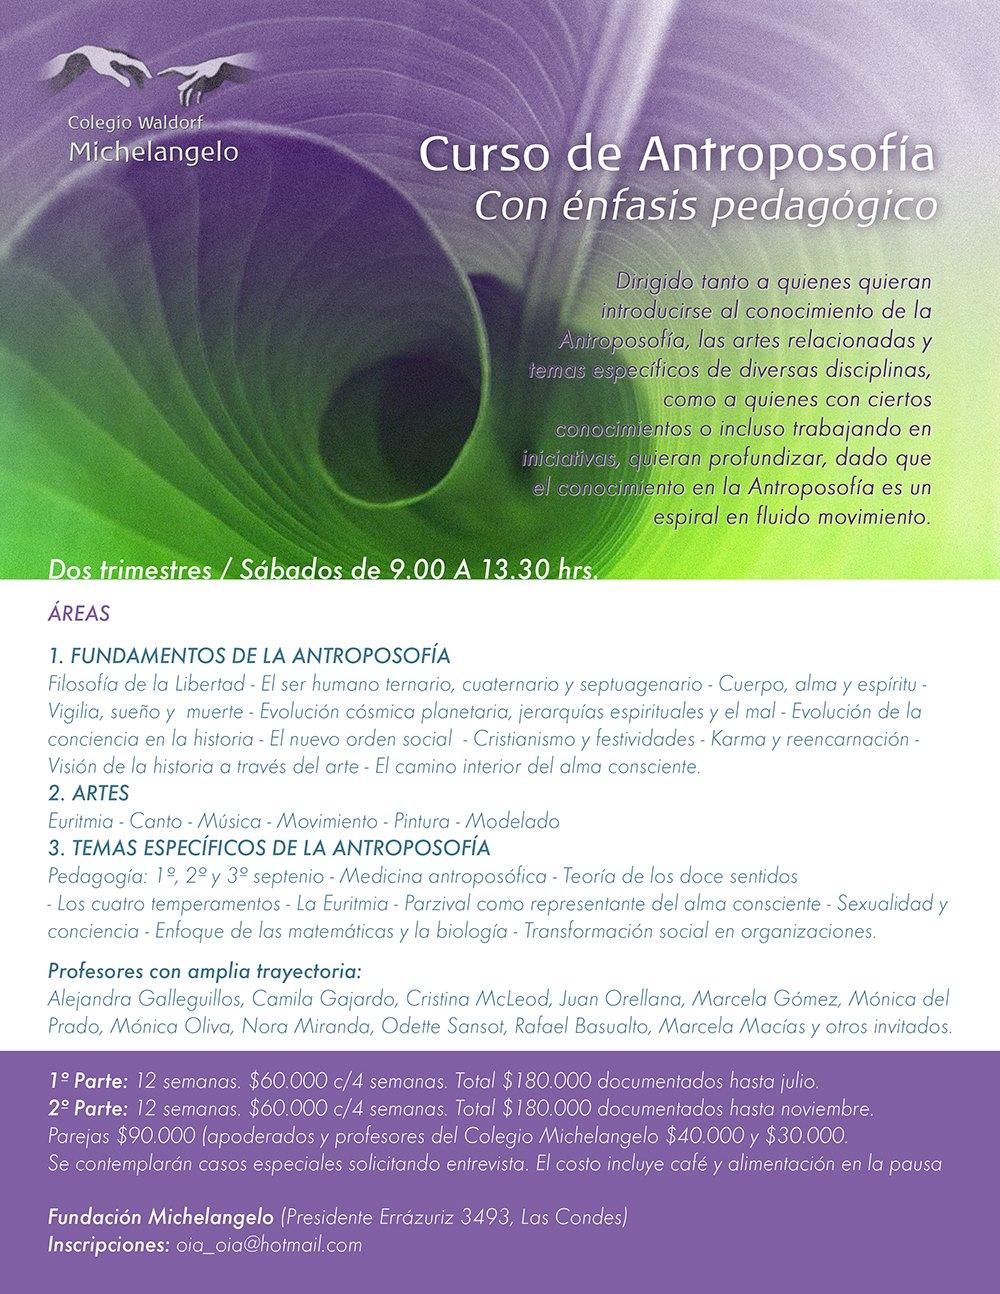 Curso de Antroposofía con Énfasis Pedagógico